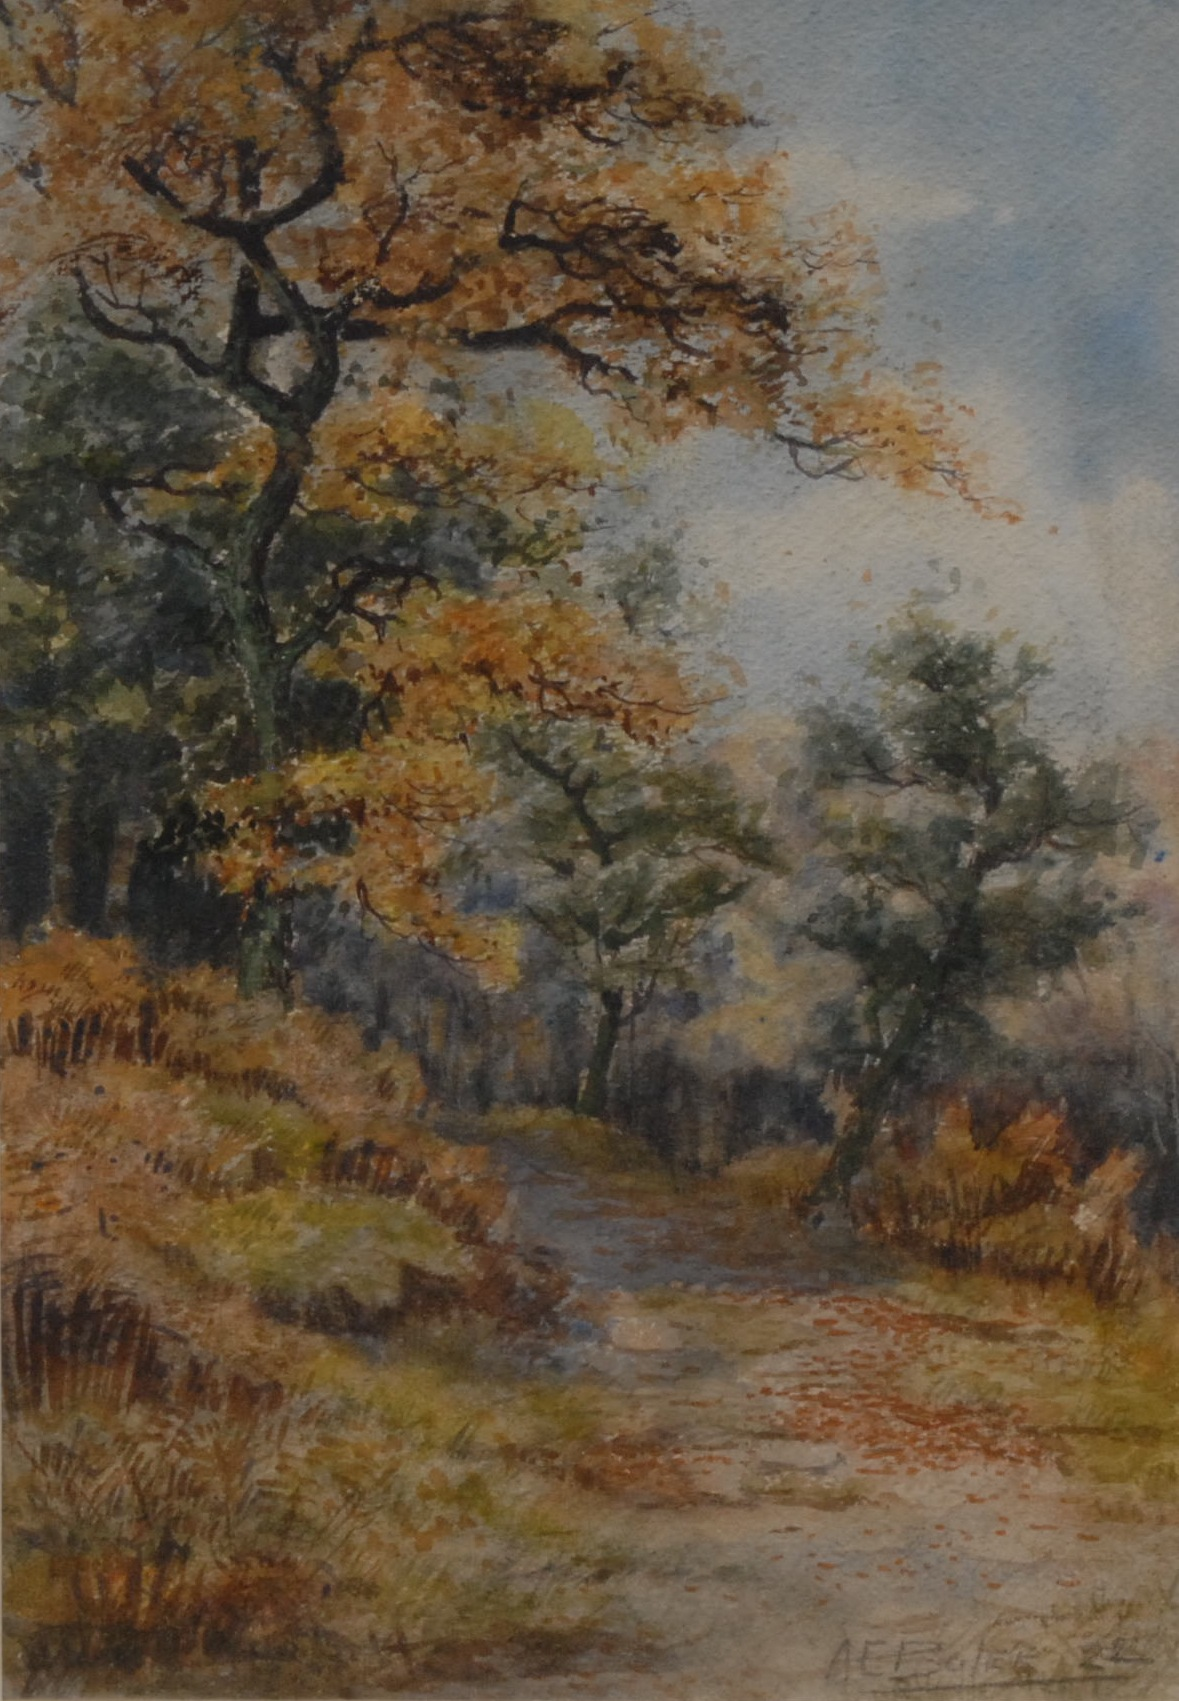 Lot 1670 - A.E. Boler (19th/20th century) Woodland Landscape signed, watercolour, 34cm x 23cm